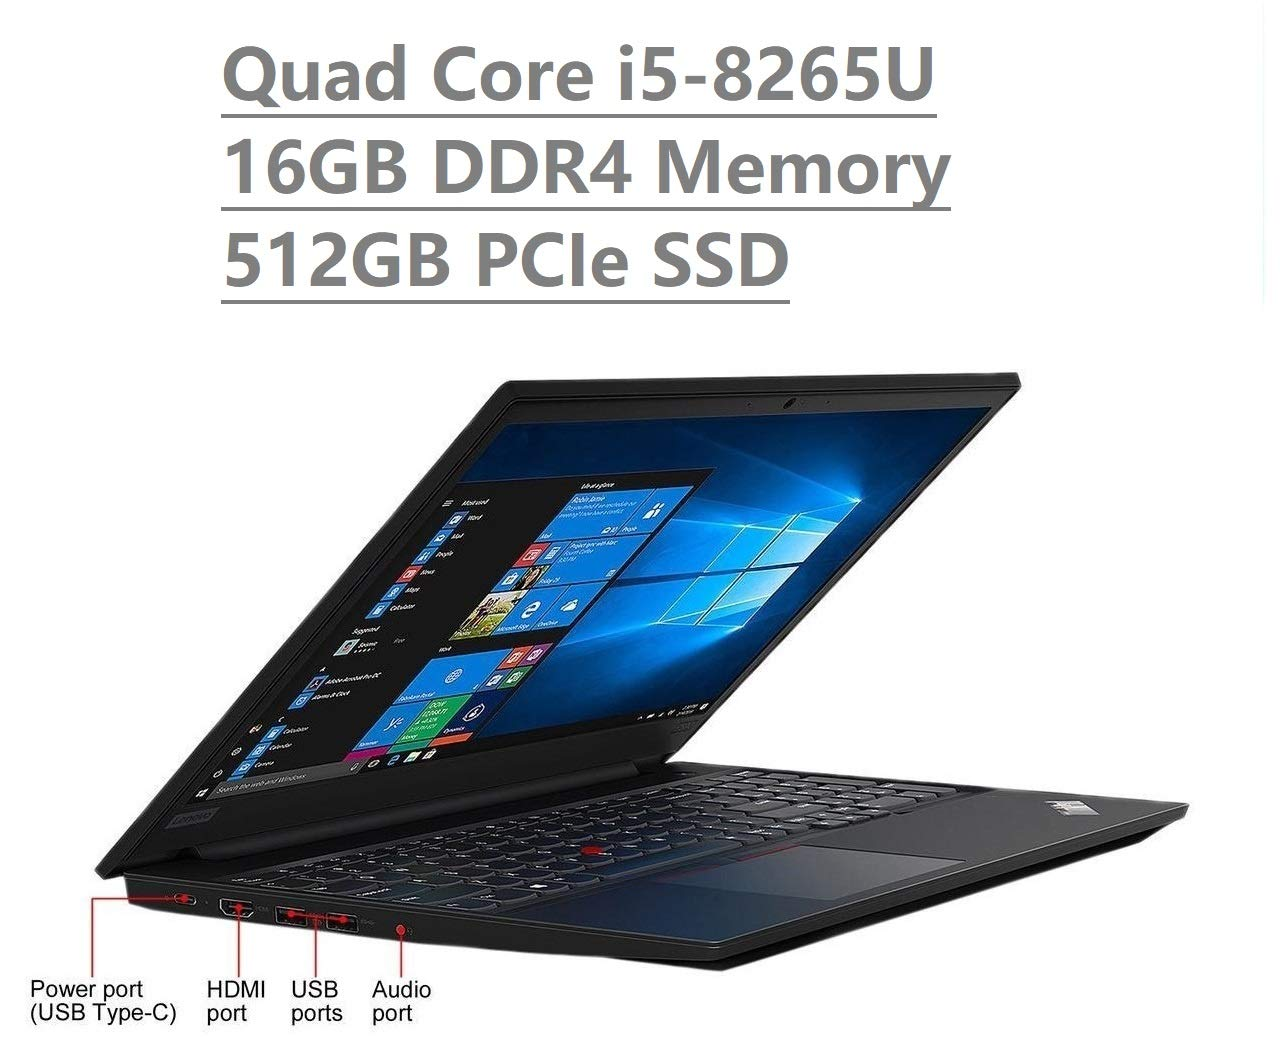 2019 Lenovo Thinkpad E590 15.6'' HD Business Laptop (Intel Quad Core i5-8265U, 16GB DDR4 Memory, 512GB PCIe 3.0(x4) NVMe SSD M.2 SSD) Type-C, HDMI, Ethernet, Webcam, Windows 10 Pro w/ IST Accessories by Lenovo